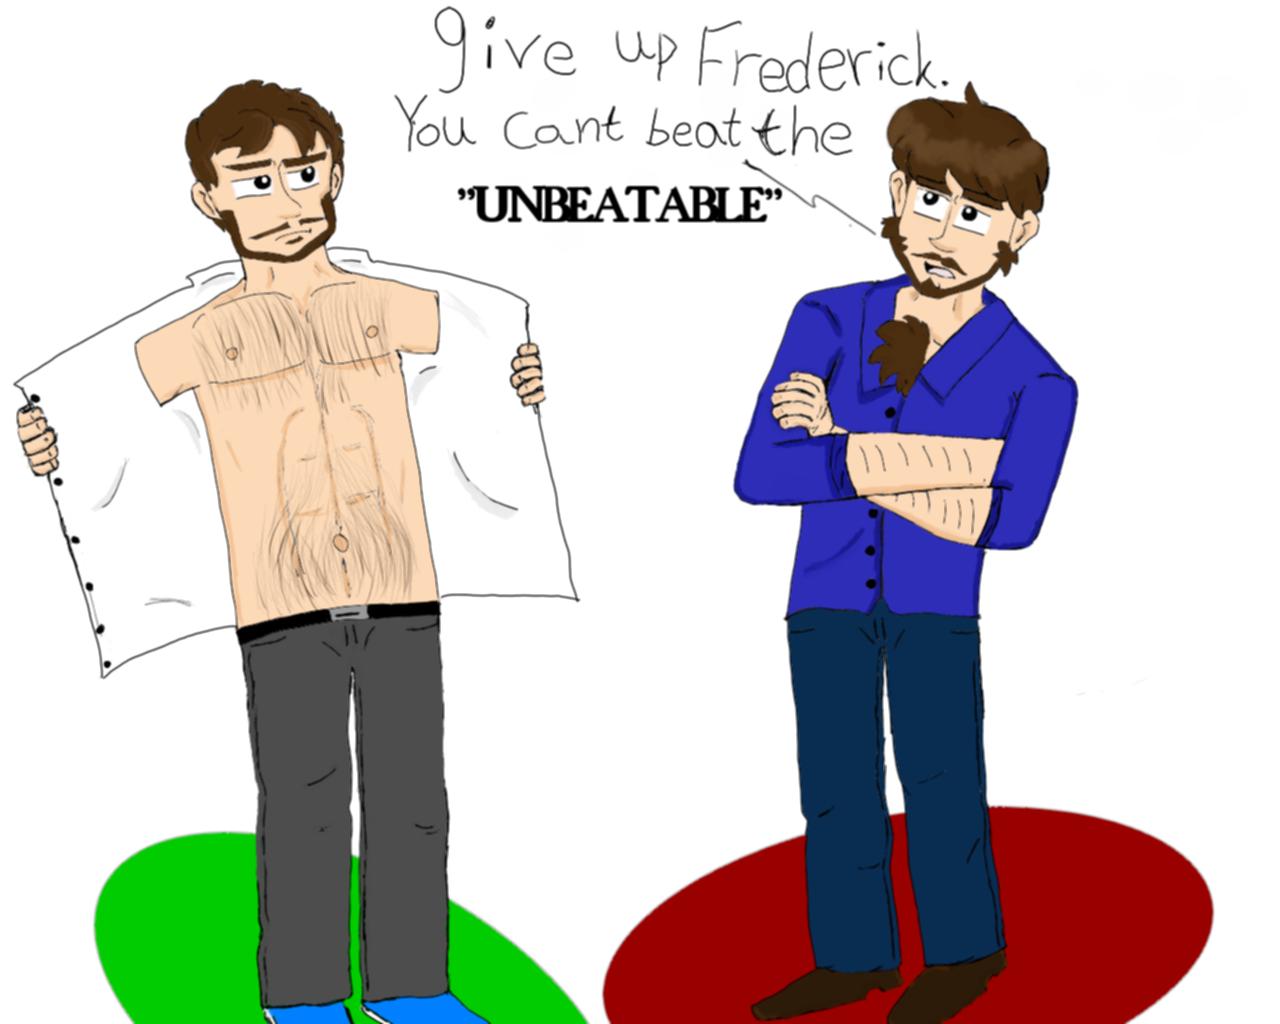 The UNBEATABLE